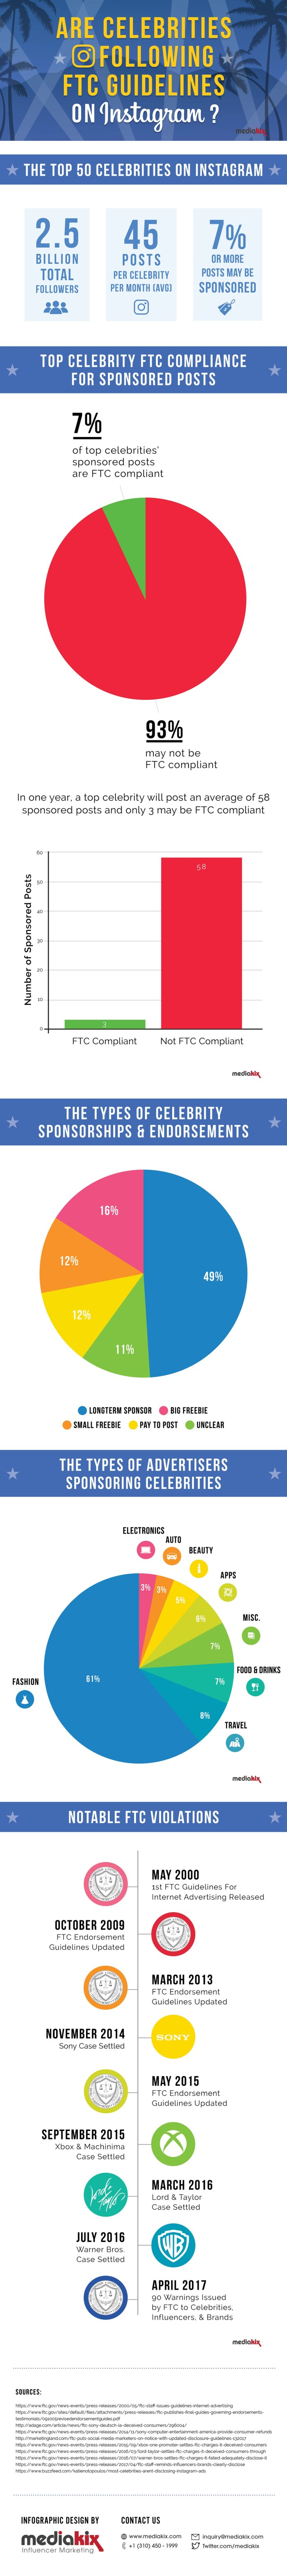 Celebrity-Social-Media-Endorsements-FTC-Violations-Instagram2 (1)